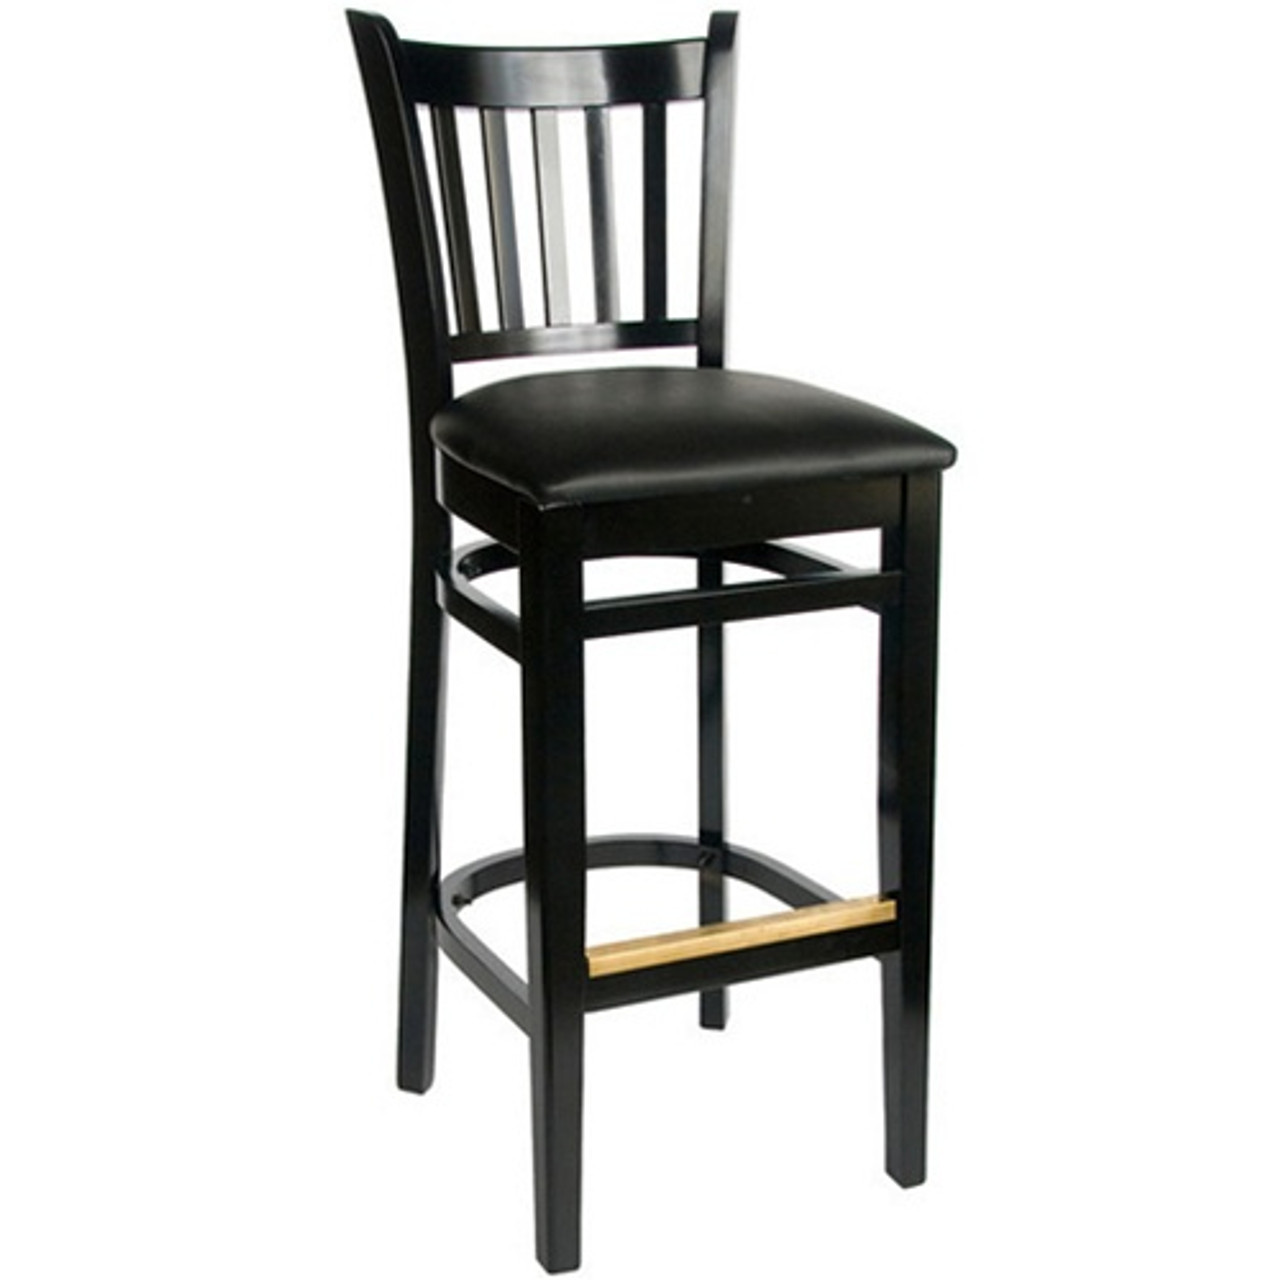 Fine Bfm Seating Delran Black Wood Slat Back Bar Stool With Vinyl Seat Lwb102Blv Customarchery Wood Chair Design Ideas Customarcherynet